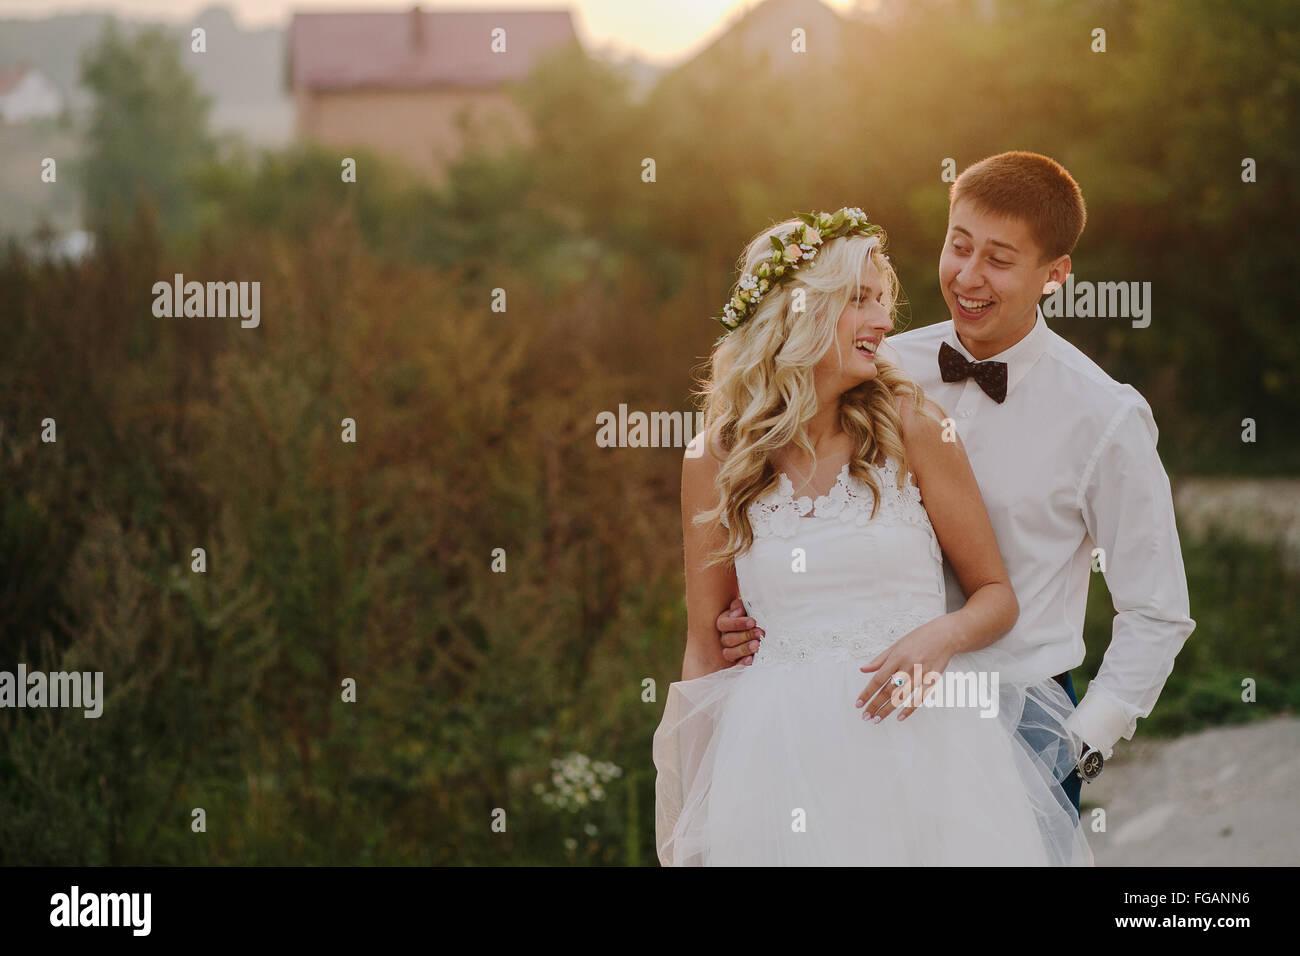 Wedding couple on the nature - Stock Image